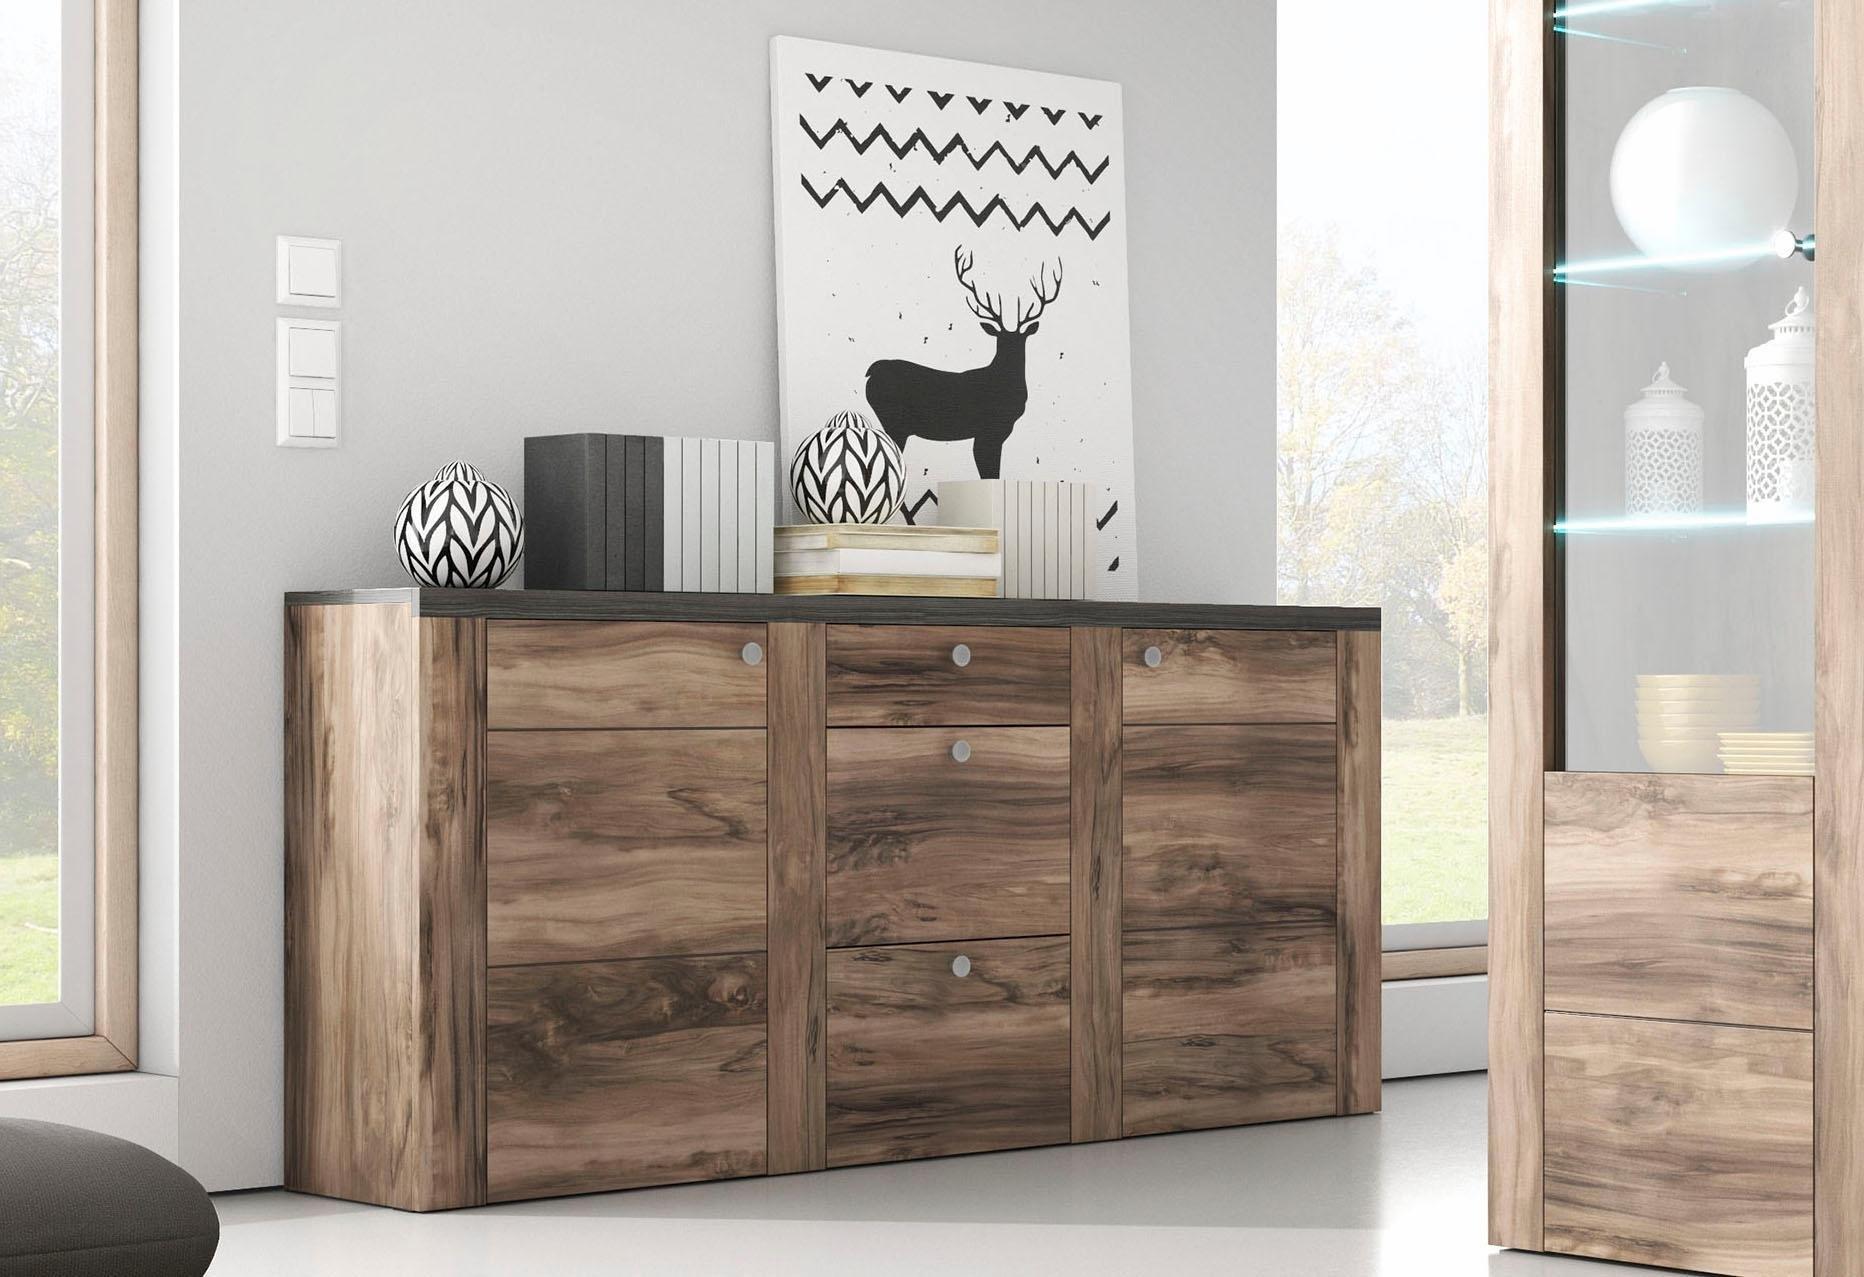 TRENDMANUFAKTUR dressoir Larona Breedte 176 cm - gratis ruilen op otto.nl